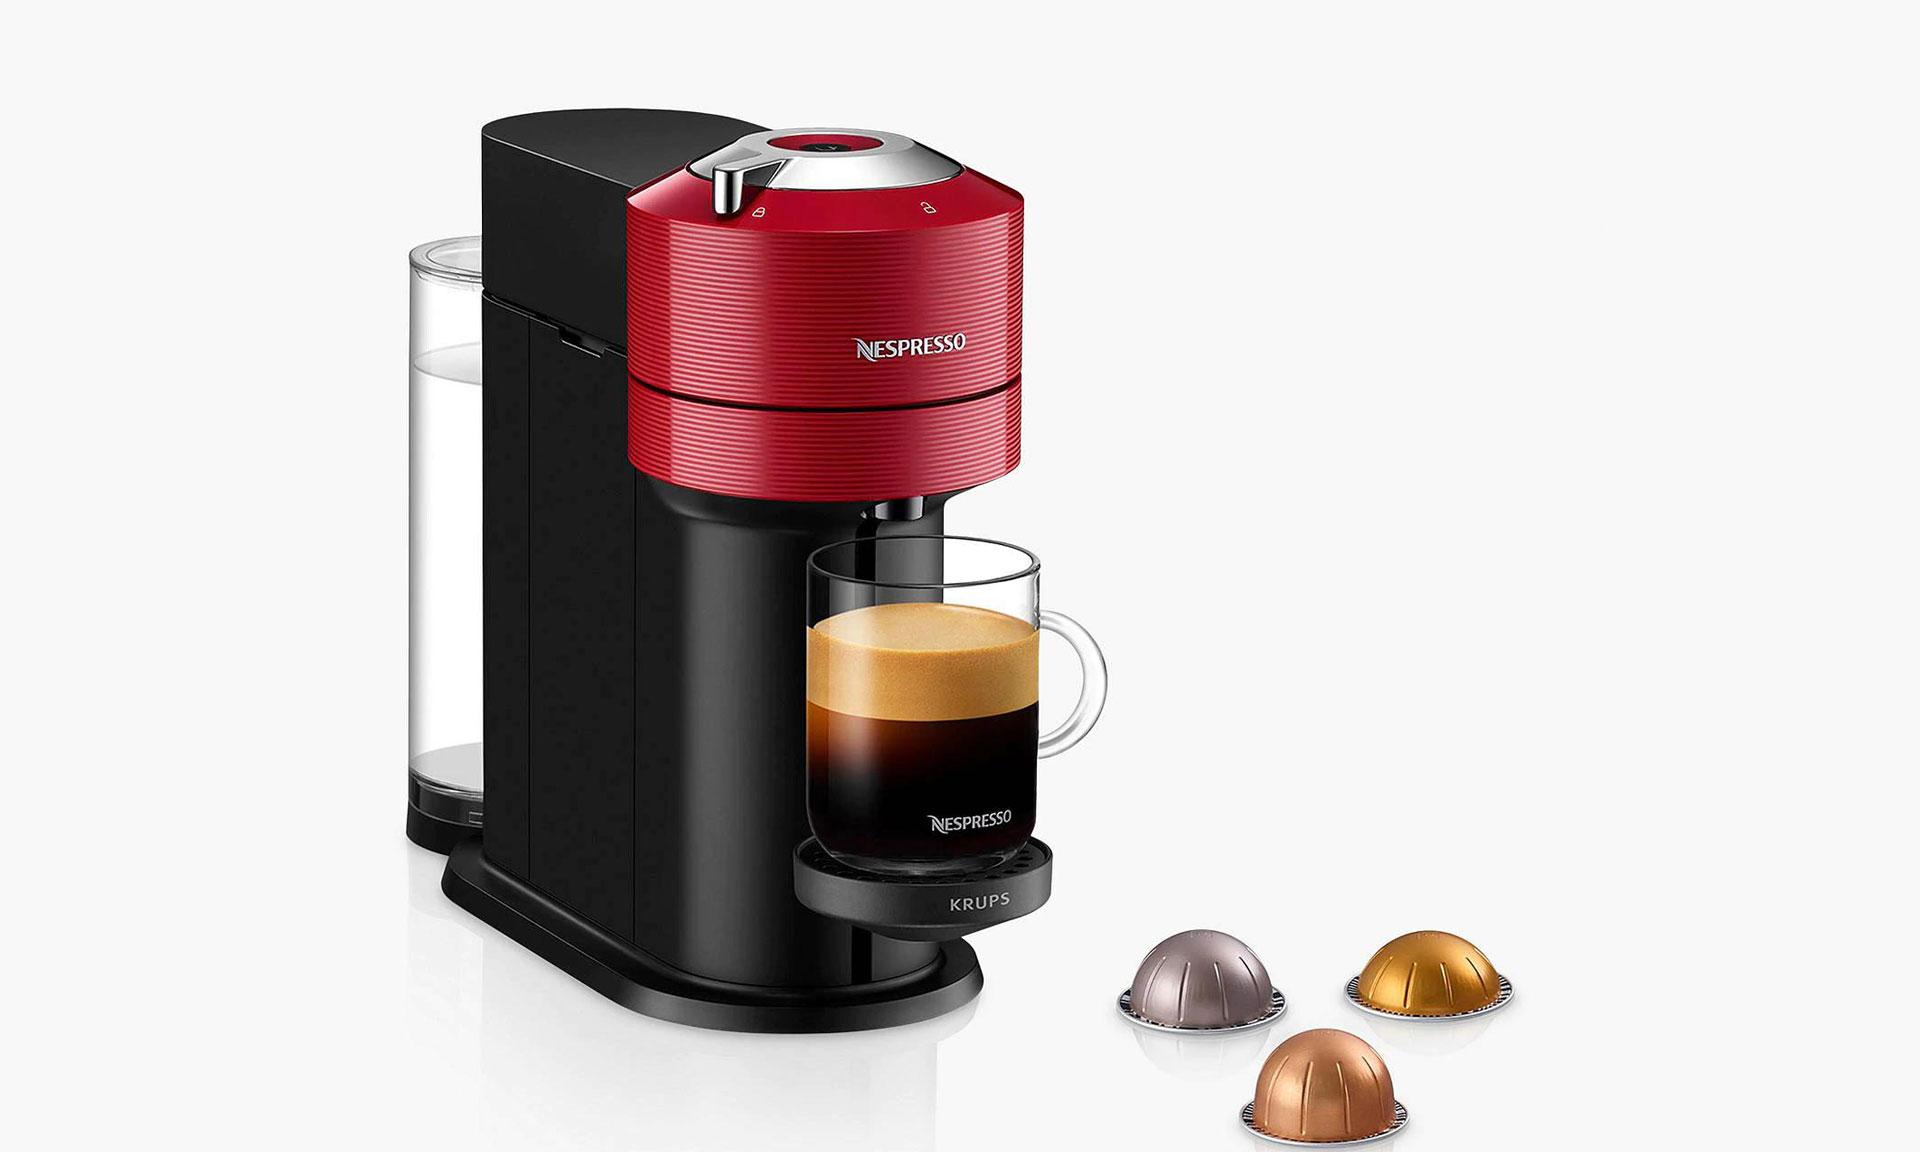 Nespresso Vertuo Next coffee machine with capsules